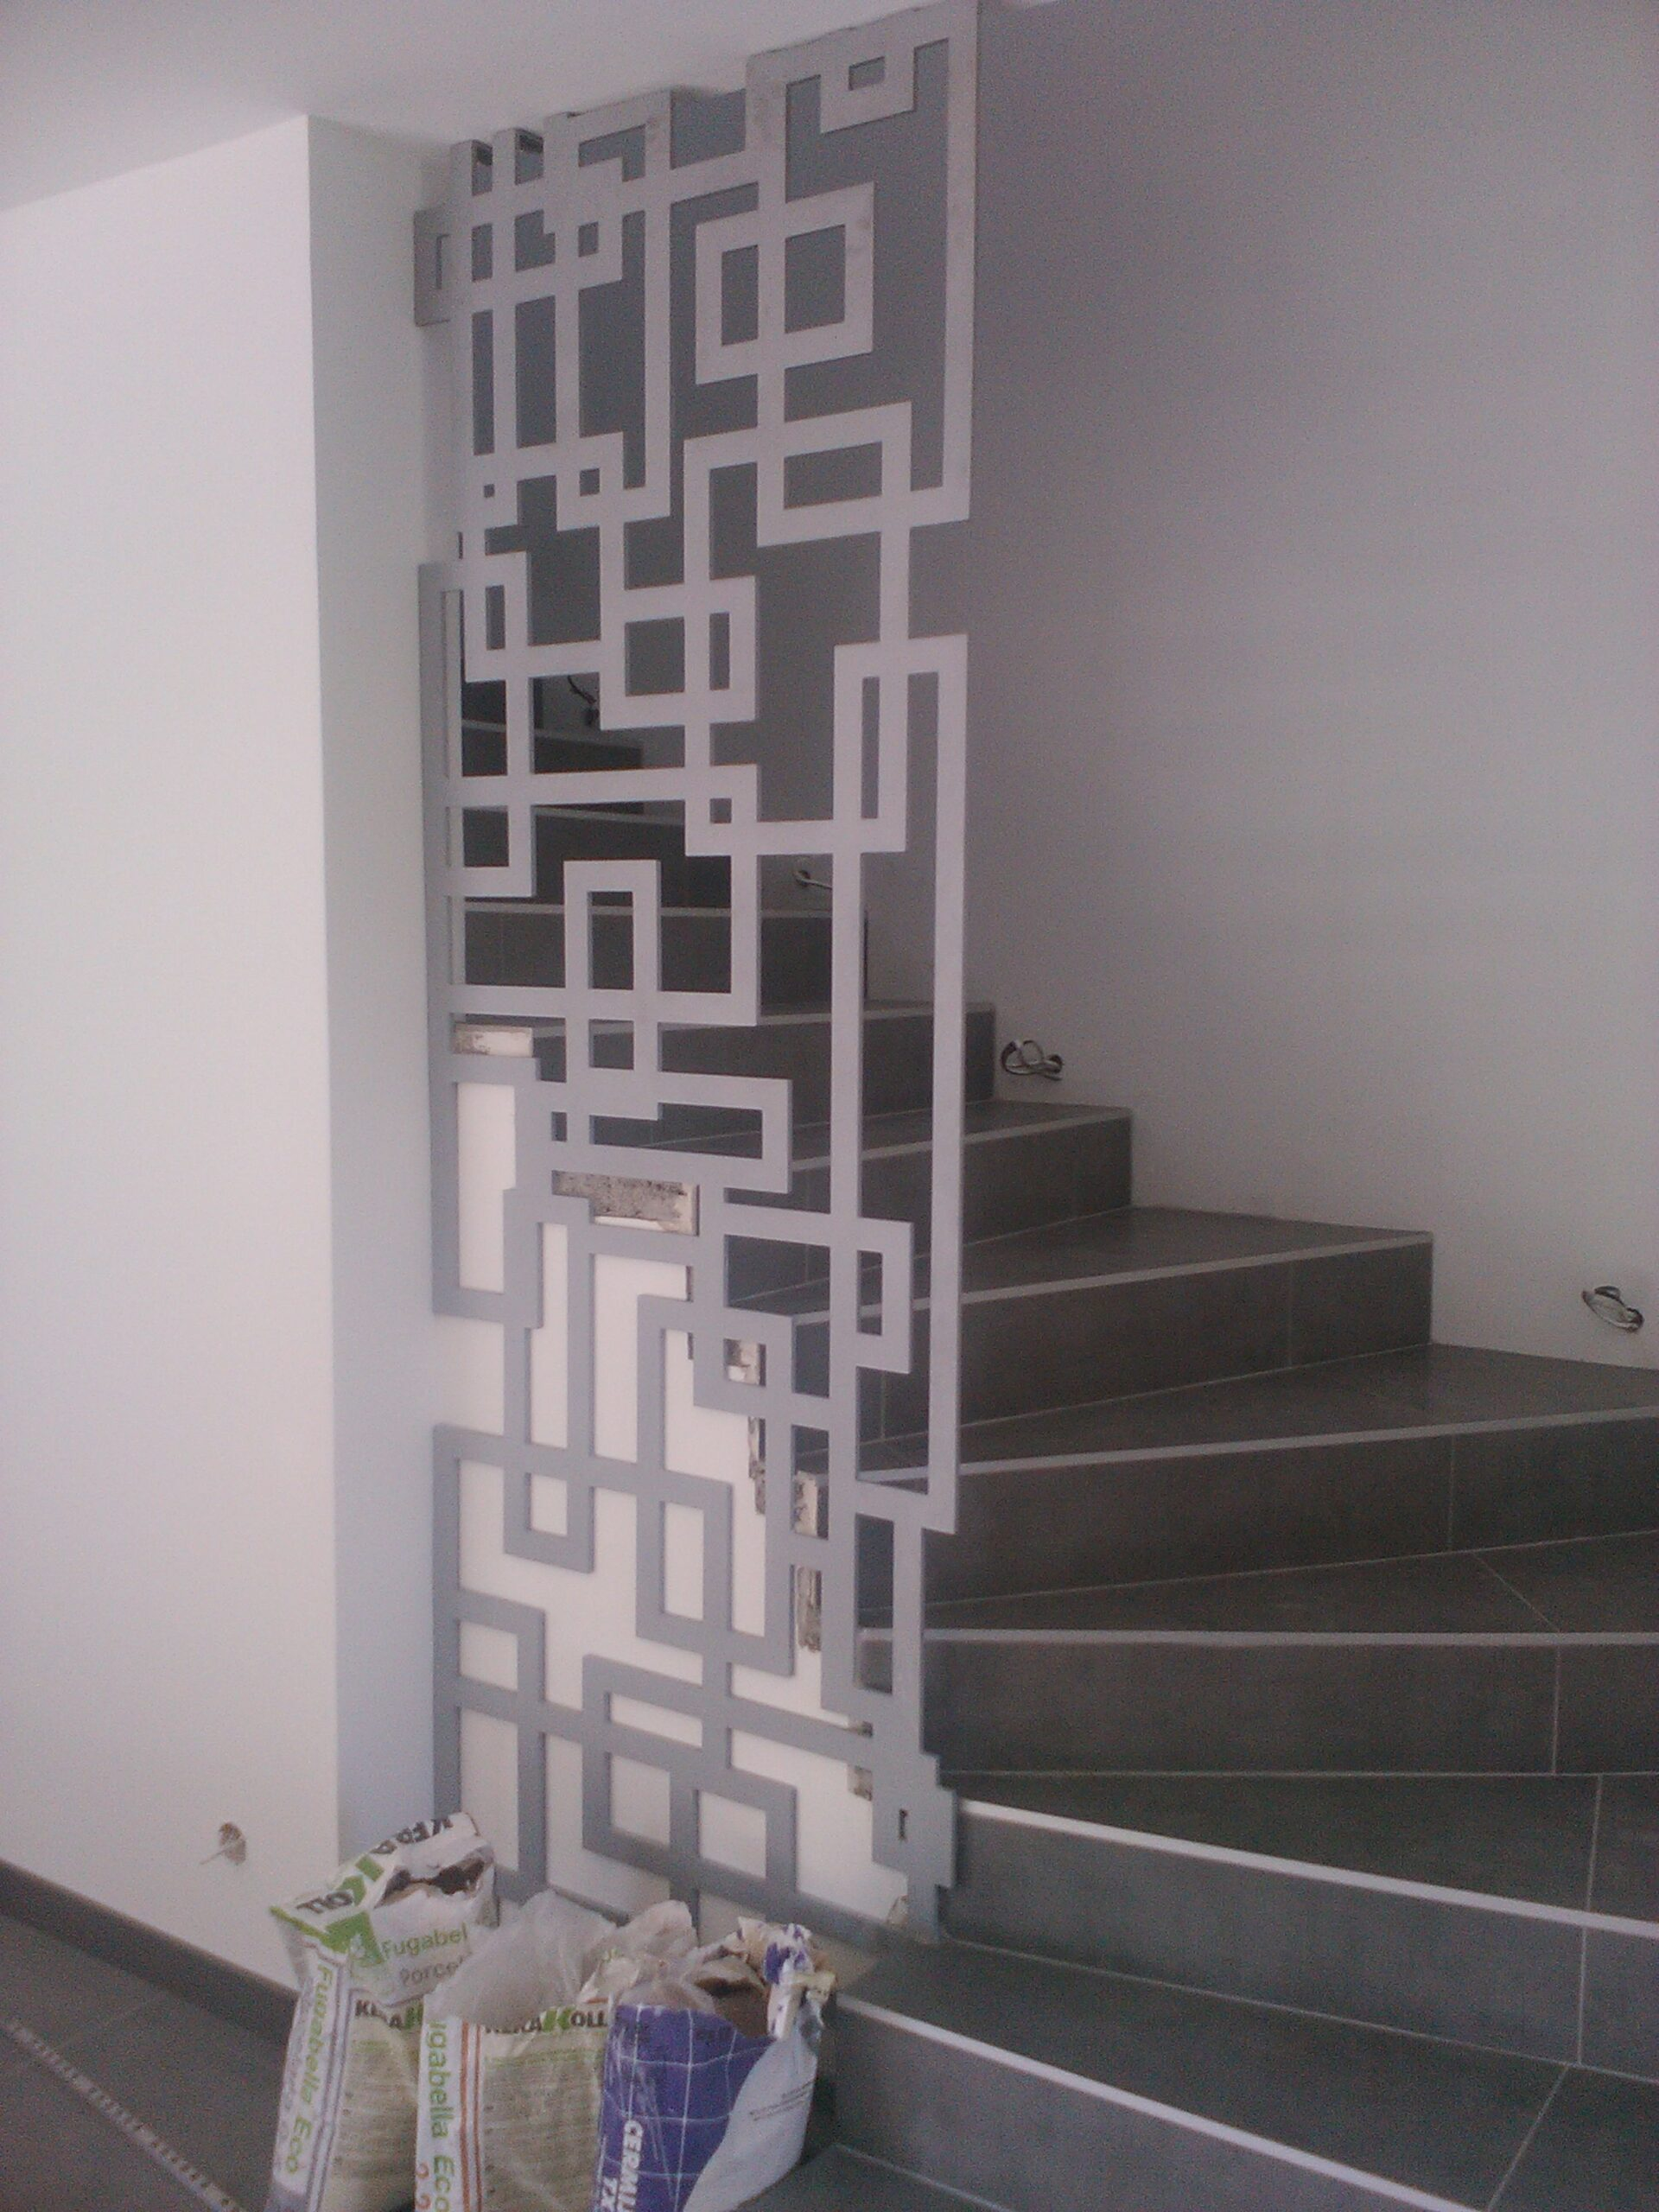 https://www.mon-artisan-ferronnier.com/wp-content/uploads/2021/04/escalier12-scaled.jpeg